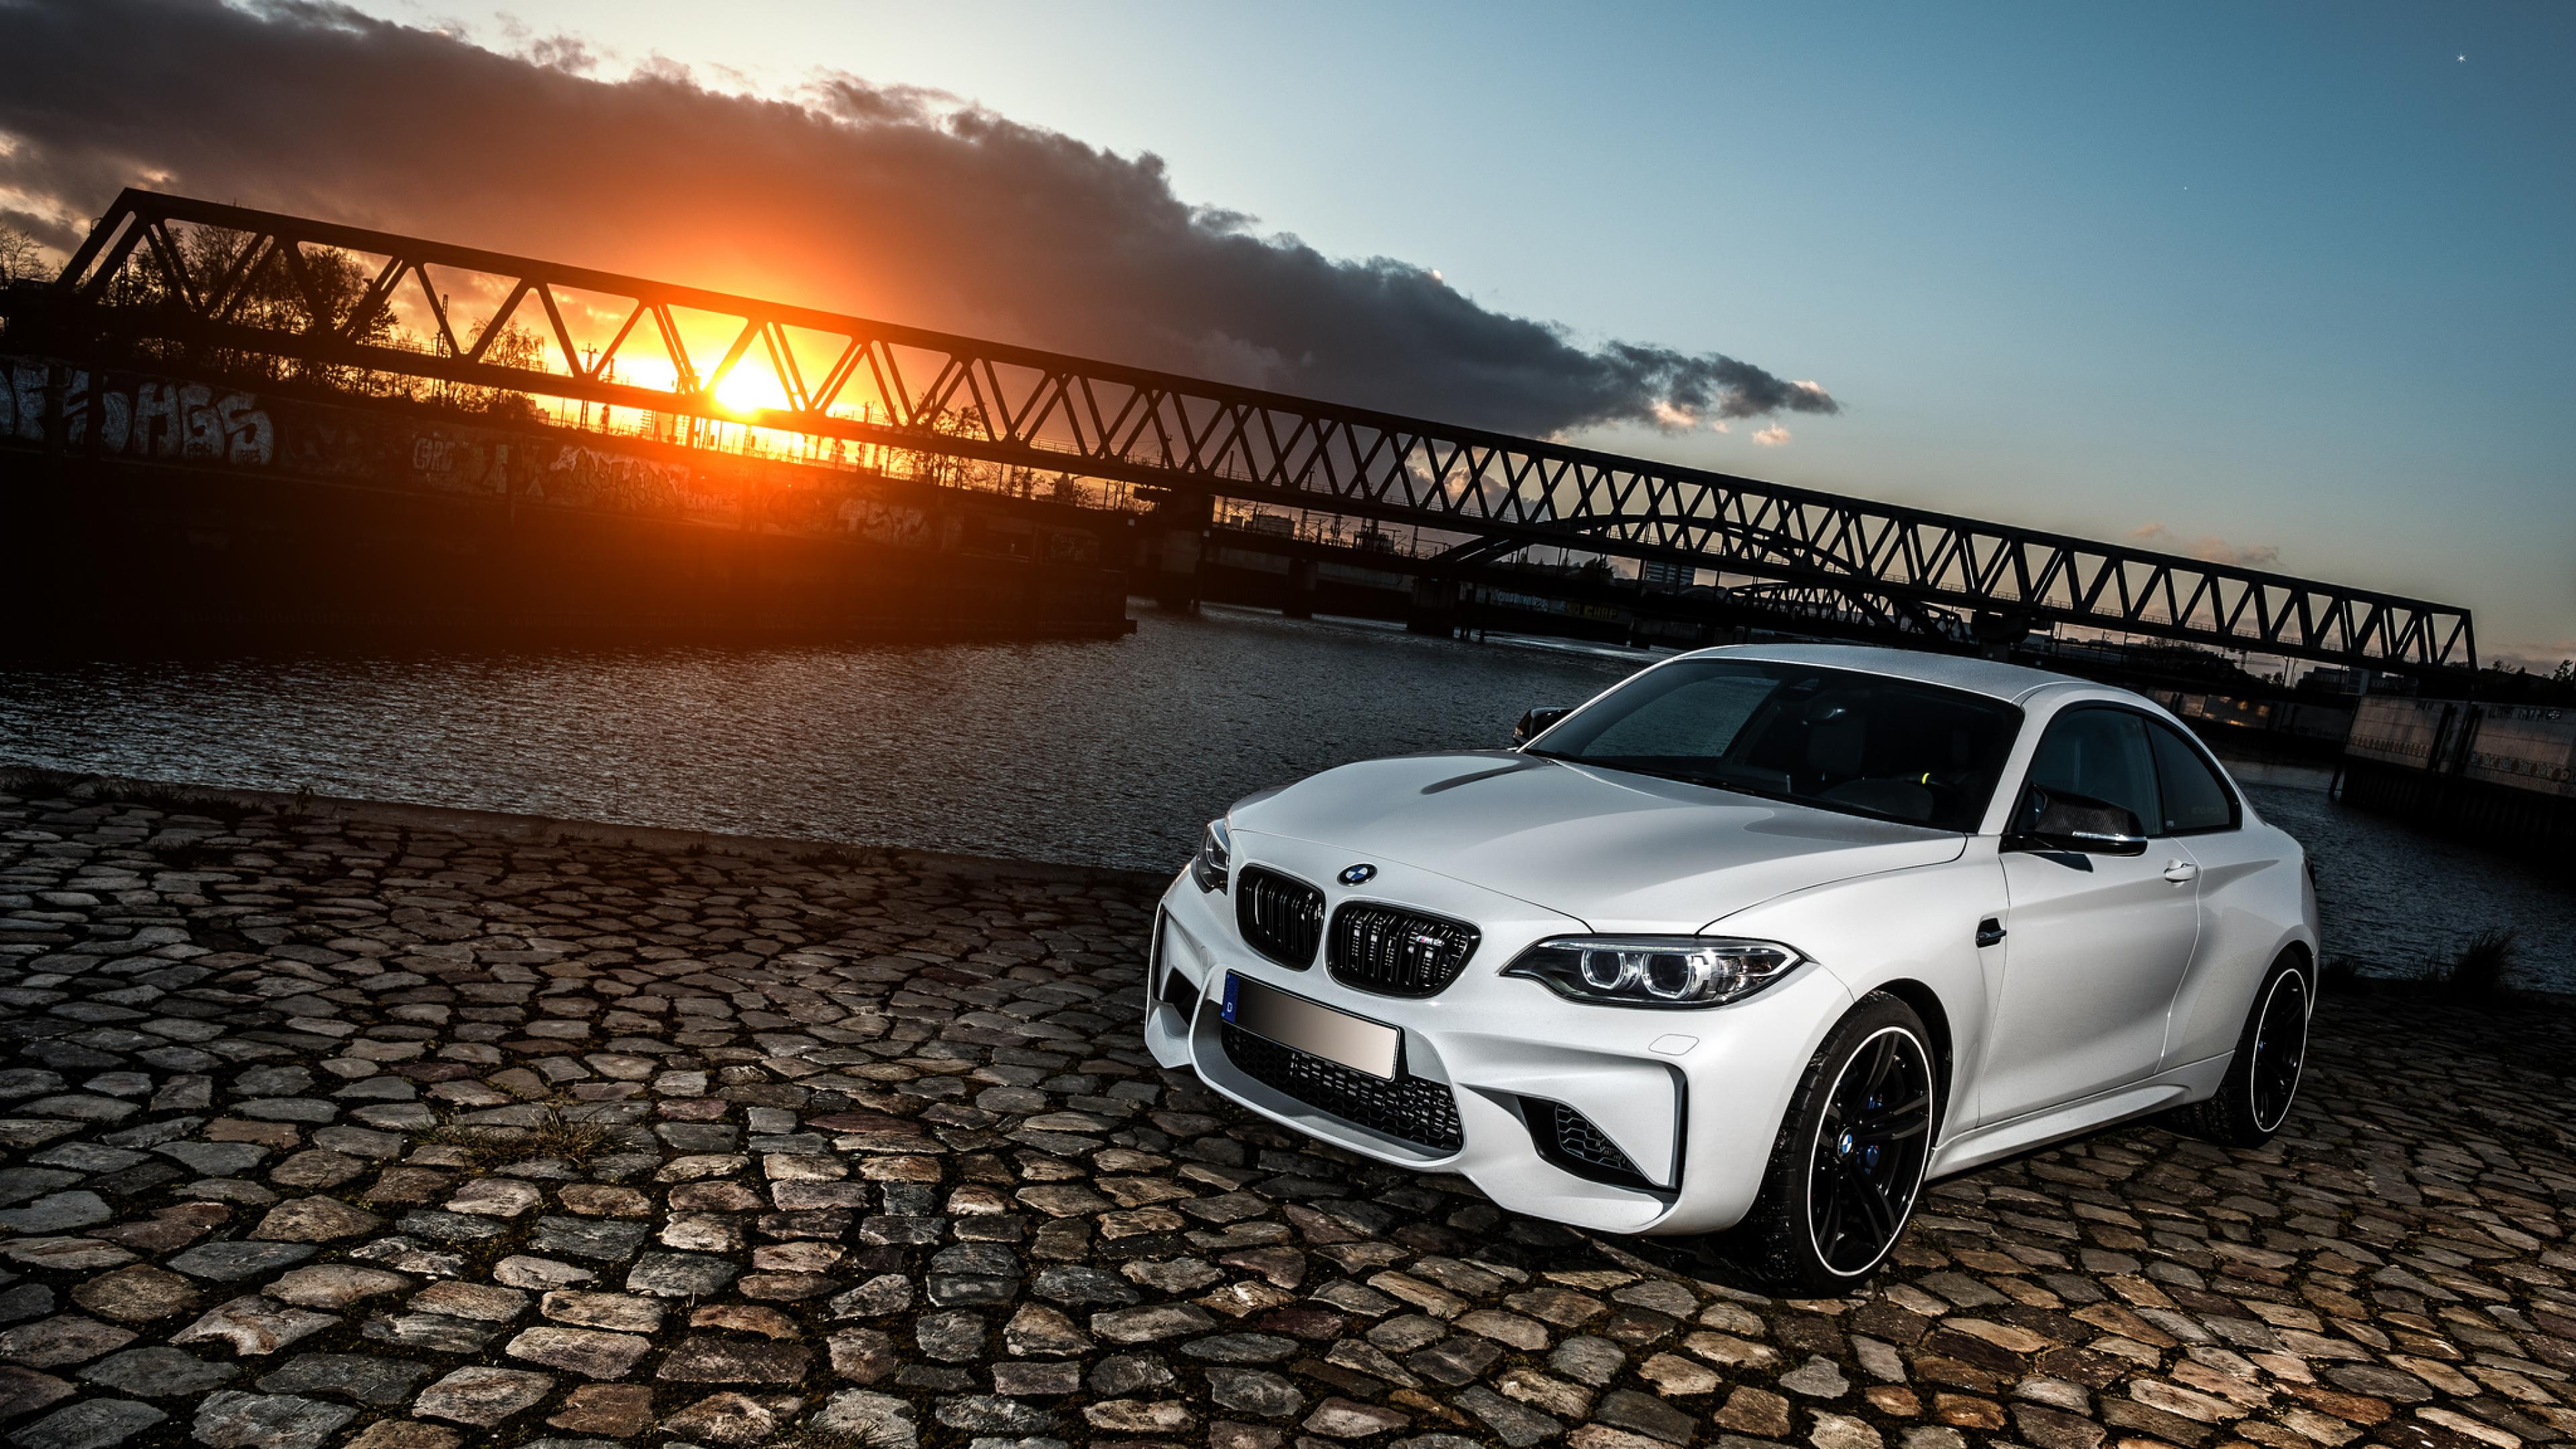 White BMW M2 car on sunset background Desktop wallpapers ...